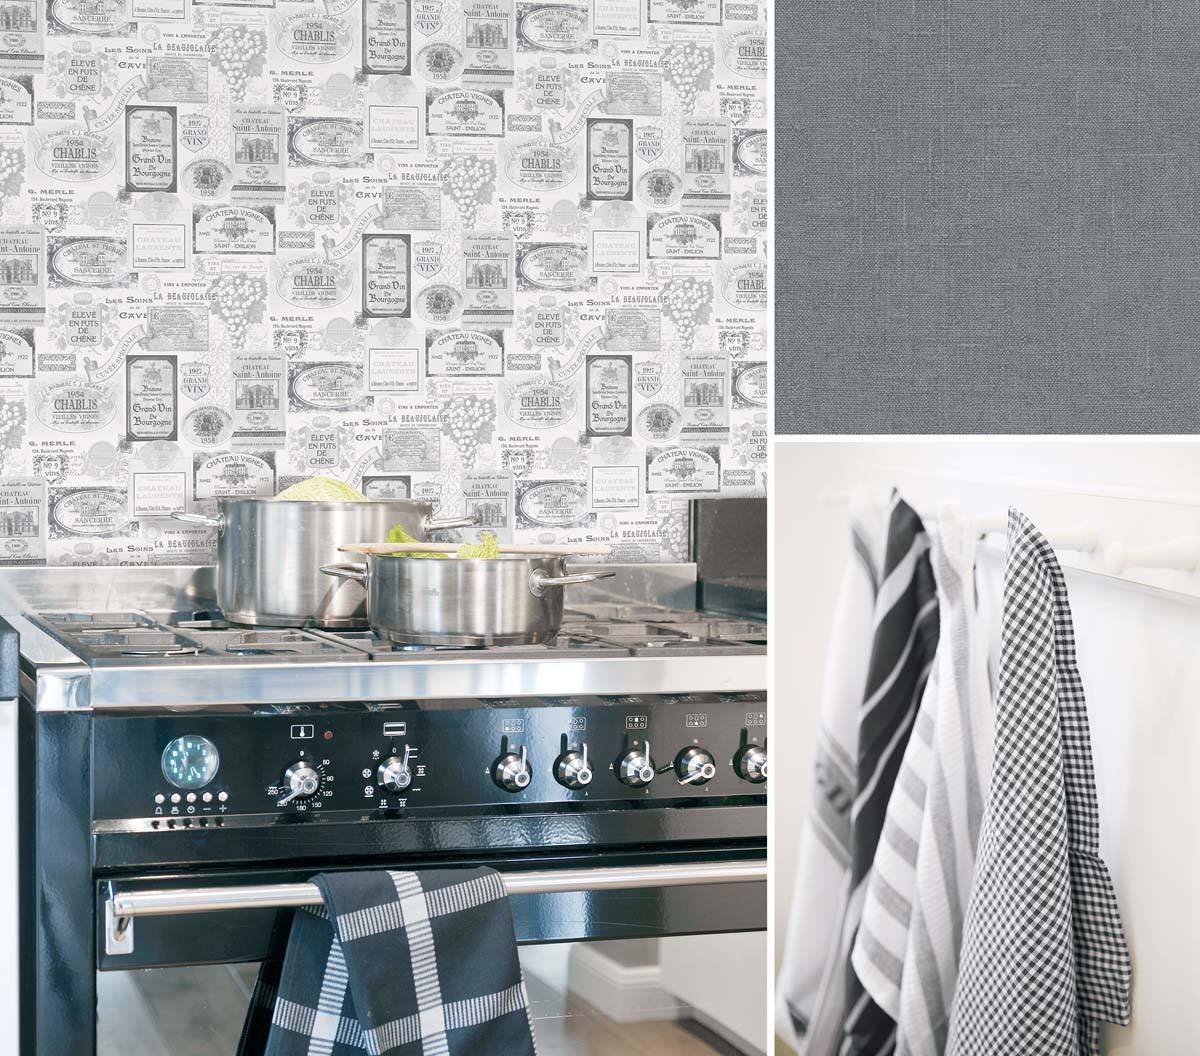 Kitchen Art Kr: Kitchen Recipes Kollektion